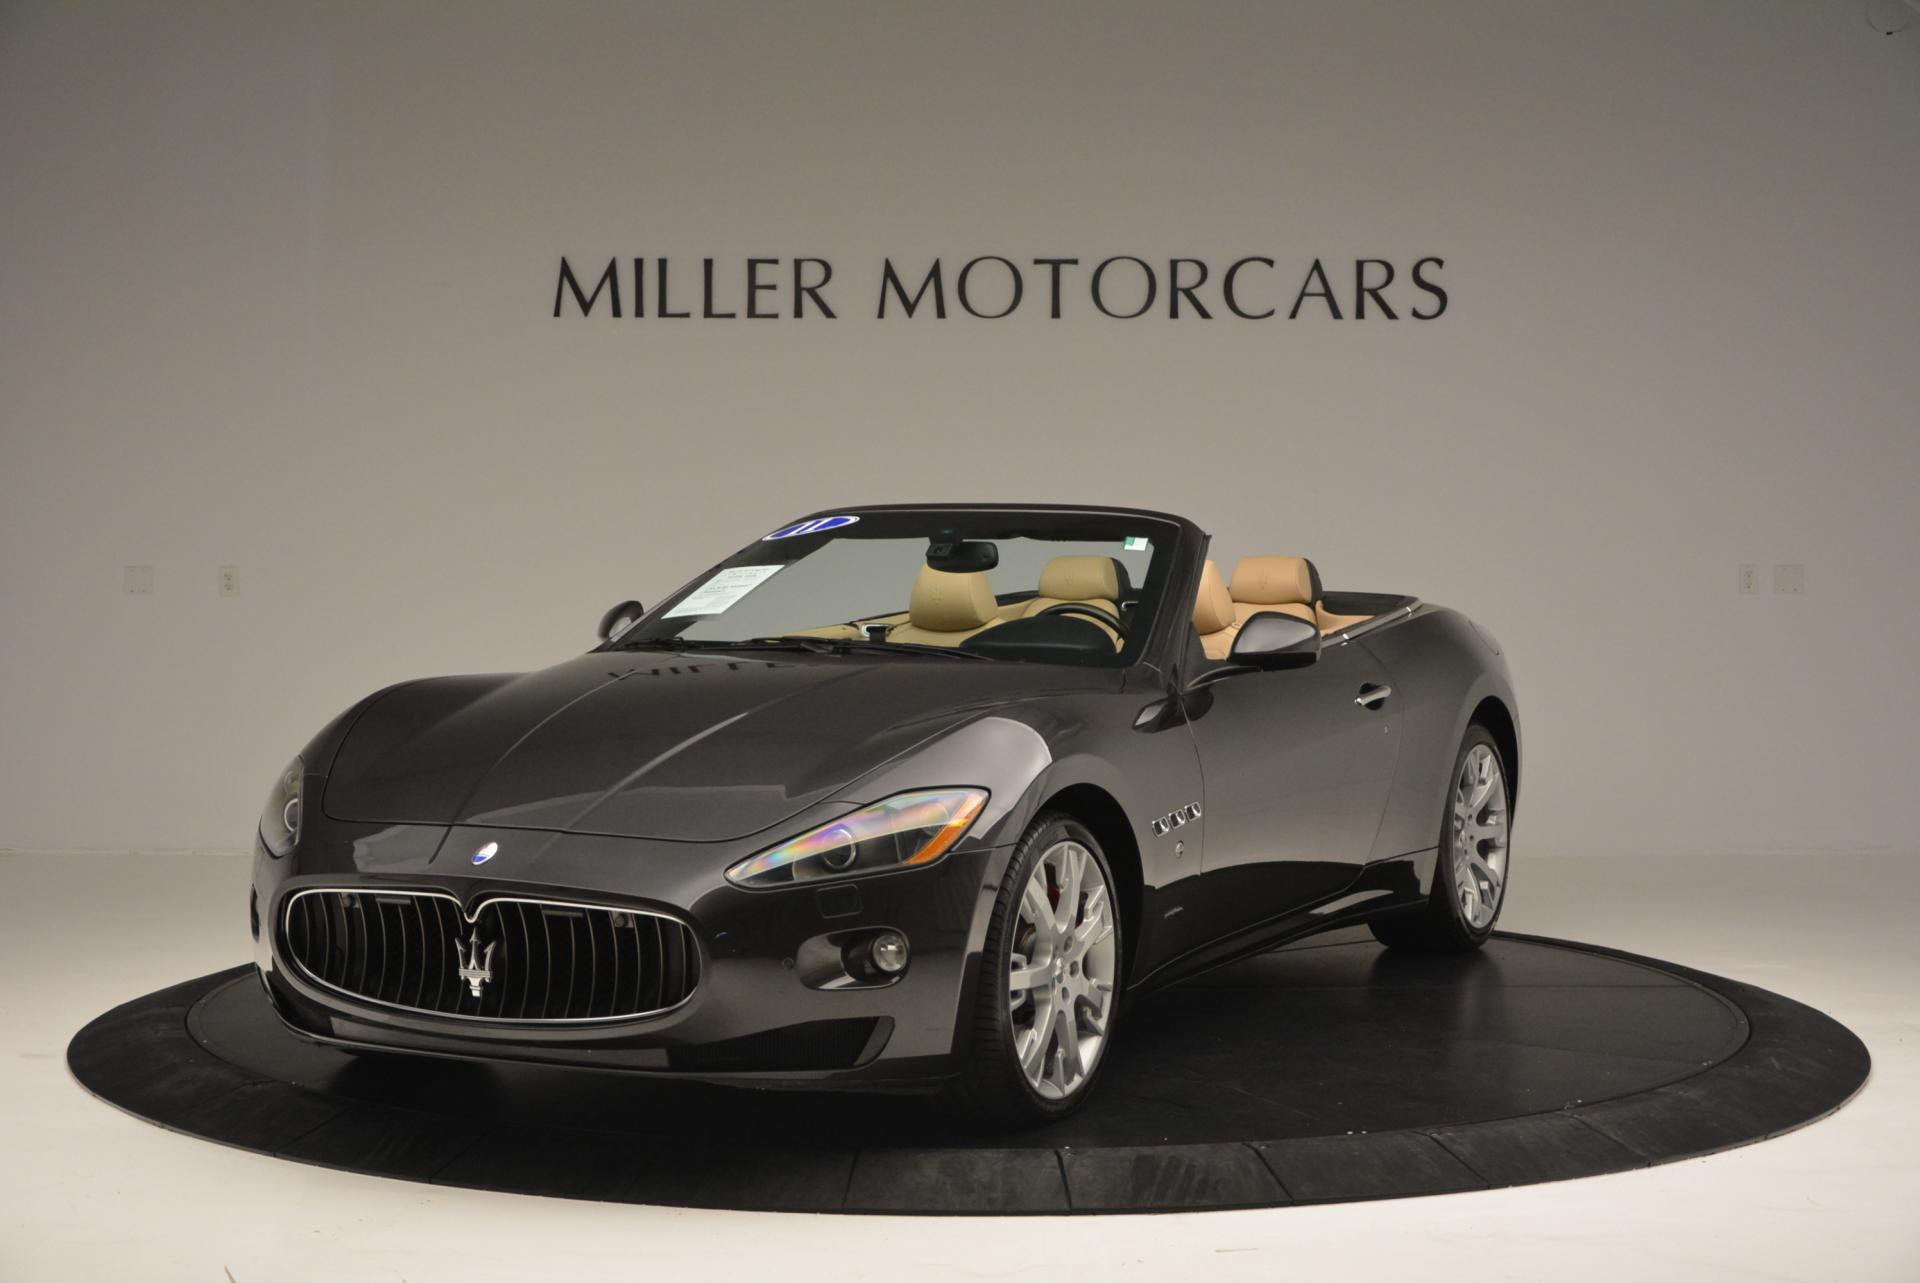 Used 2011 Maserati GranTurismo Base for sale Sold at Maserati of Westport in Westport CT 06880 1